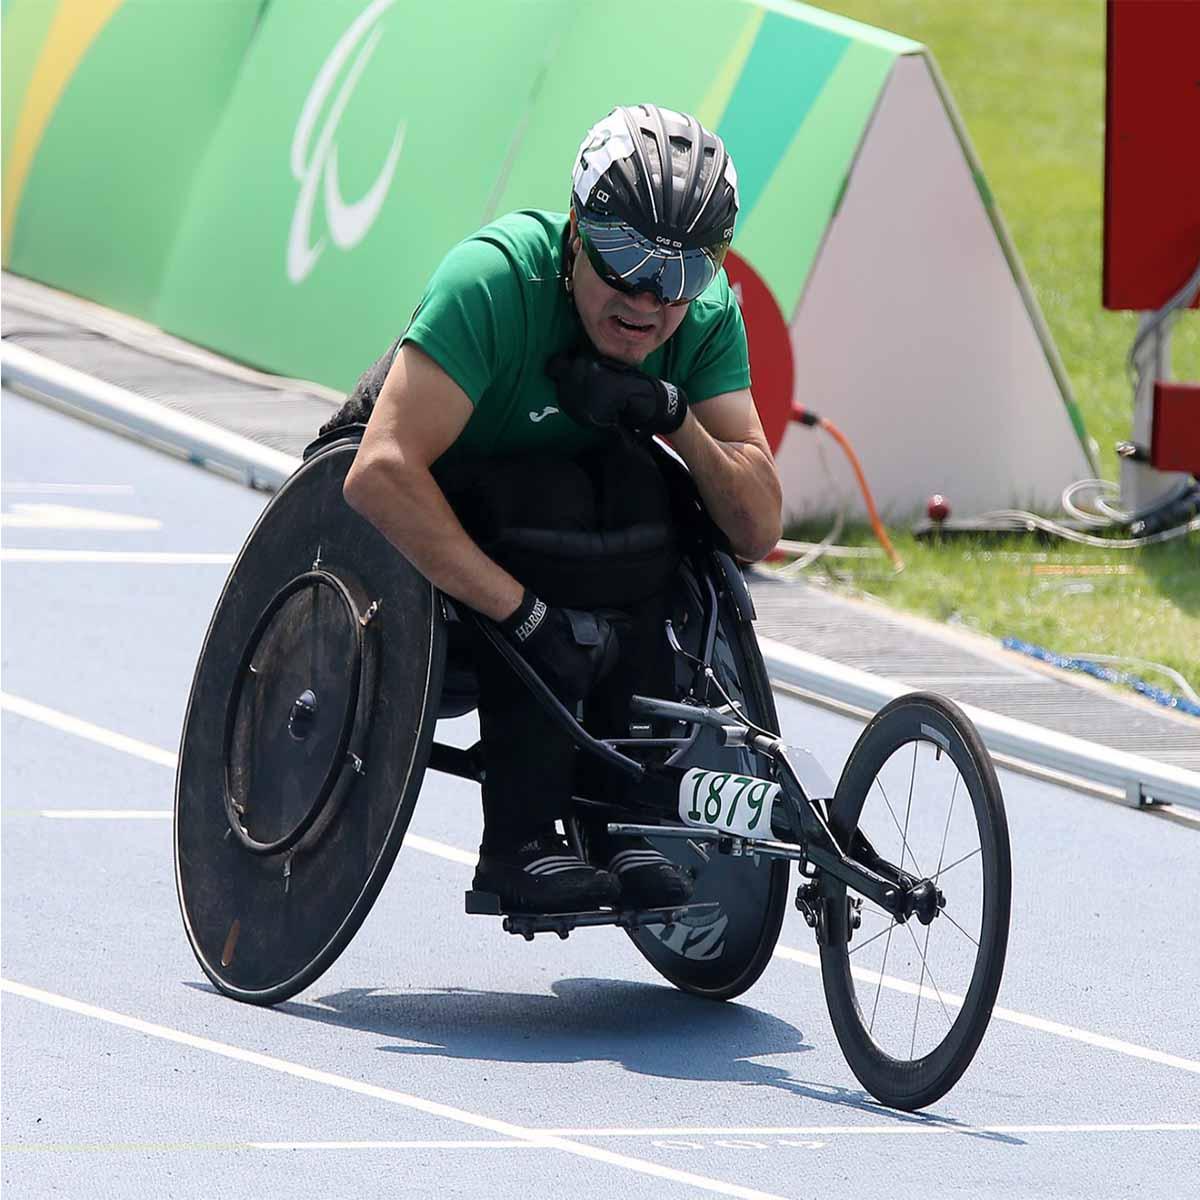 Deportistas mexiquenses listos para los Paralímpicos de Tokio 2020